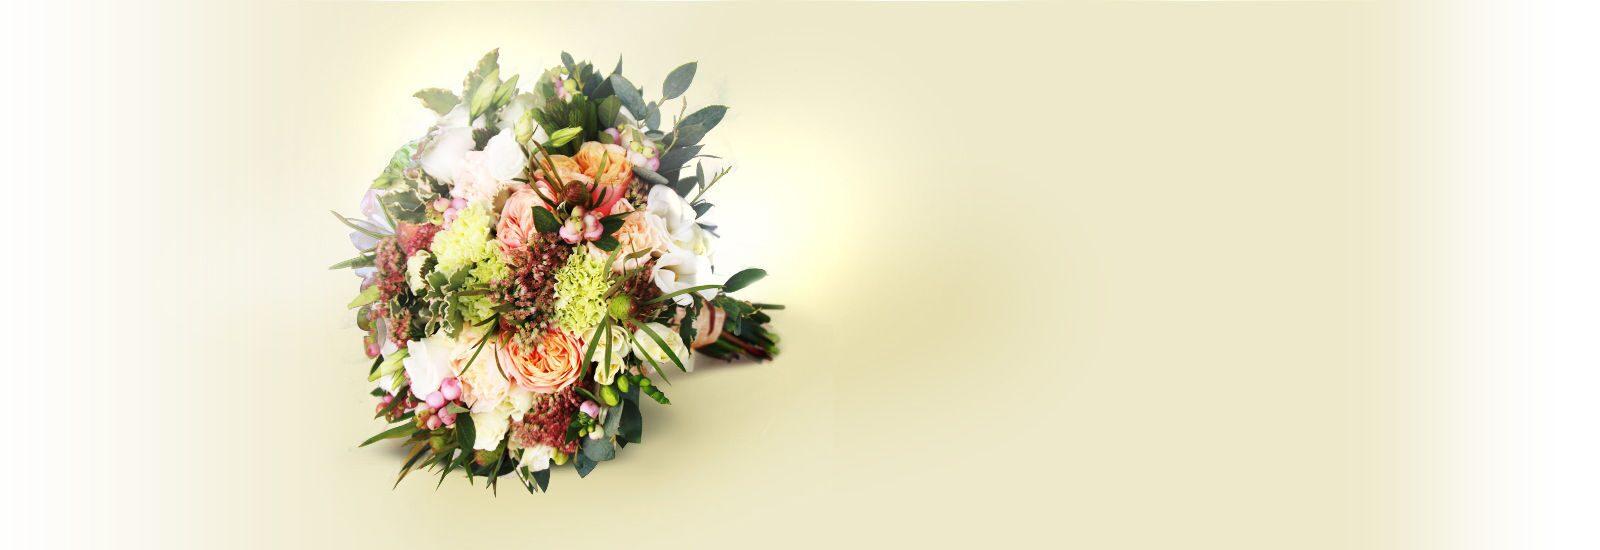 магазин цветов в инстаграме